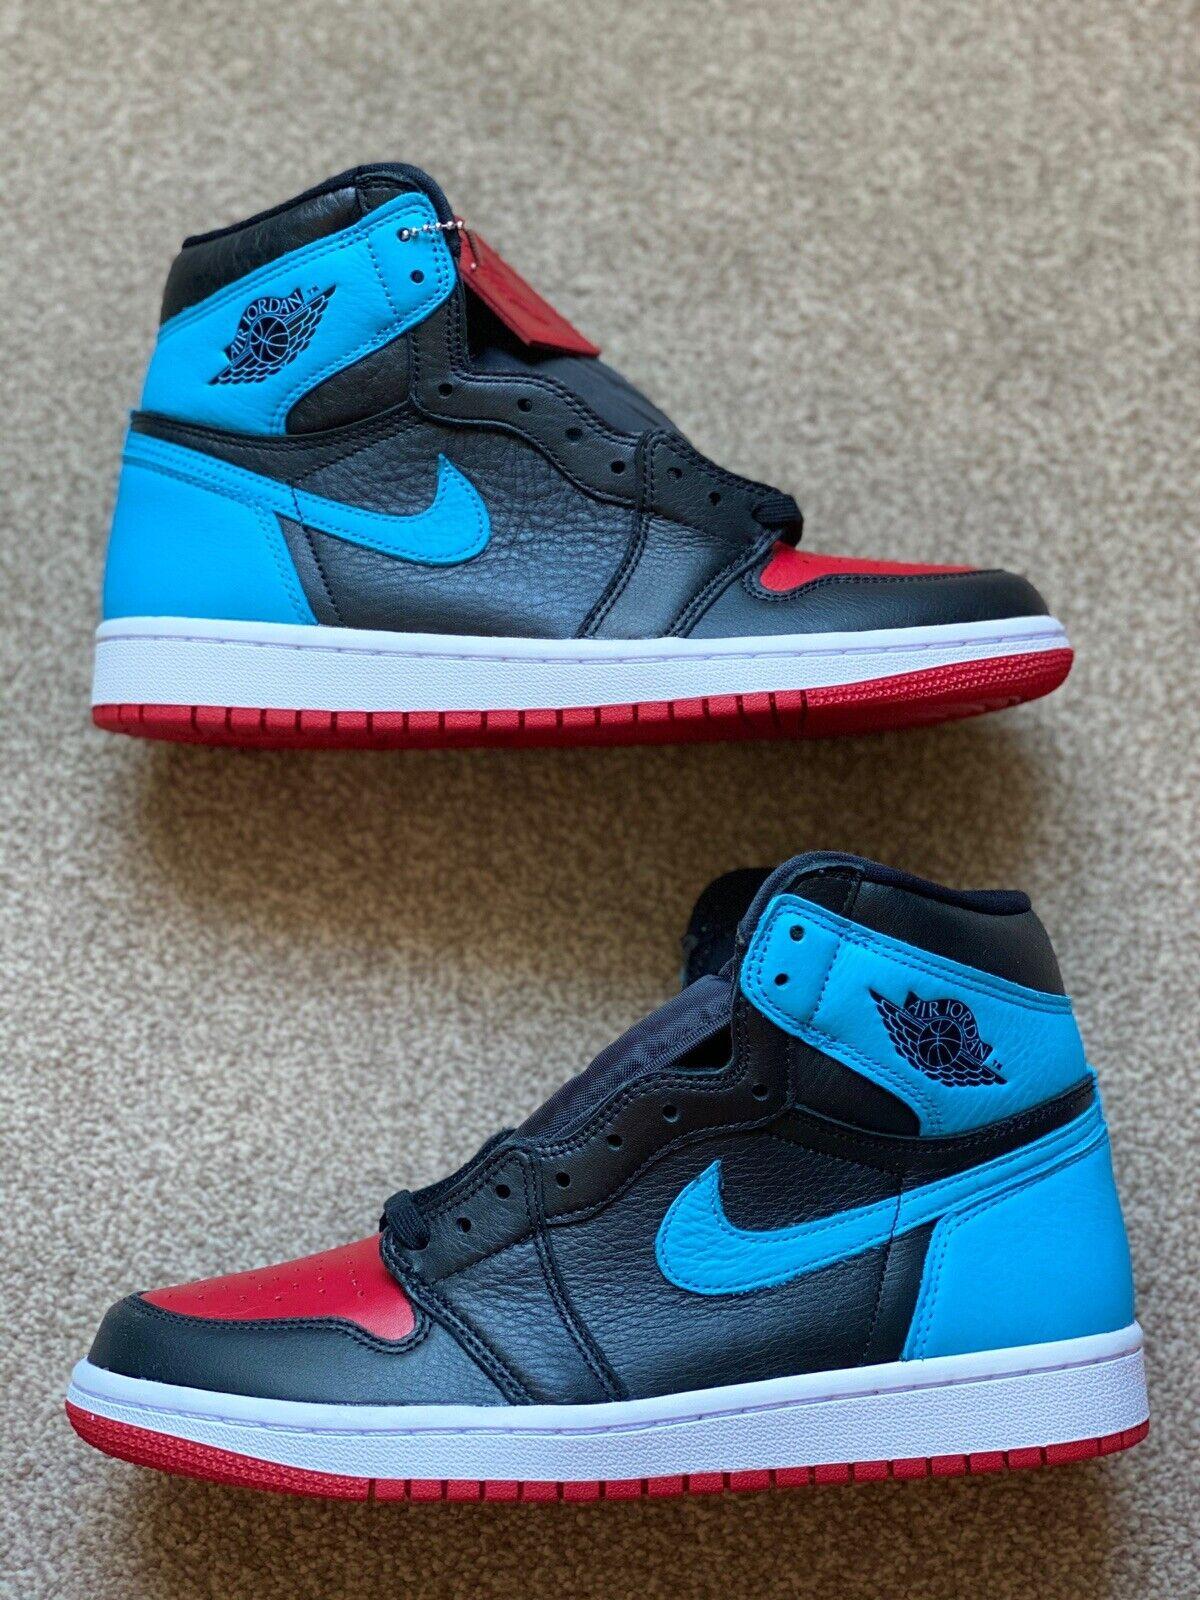 Jordan 1 Retro High NC to Chi Leather CD0461-046 - Size UK6.5/US7.5/EU40.5/US9W